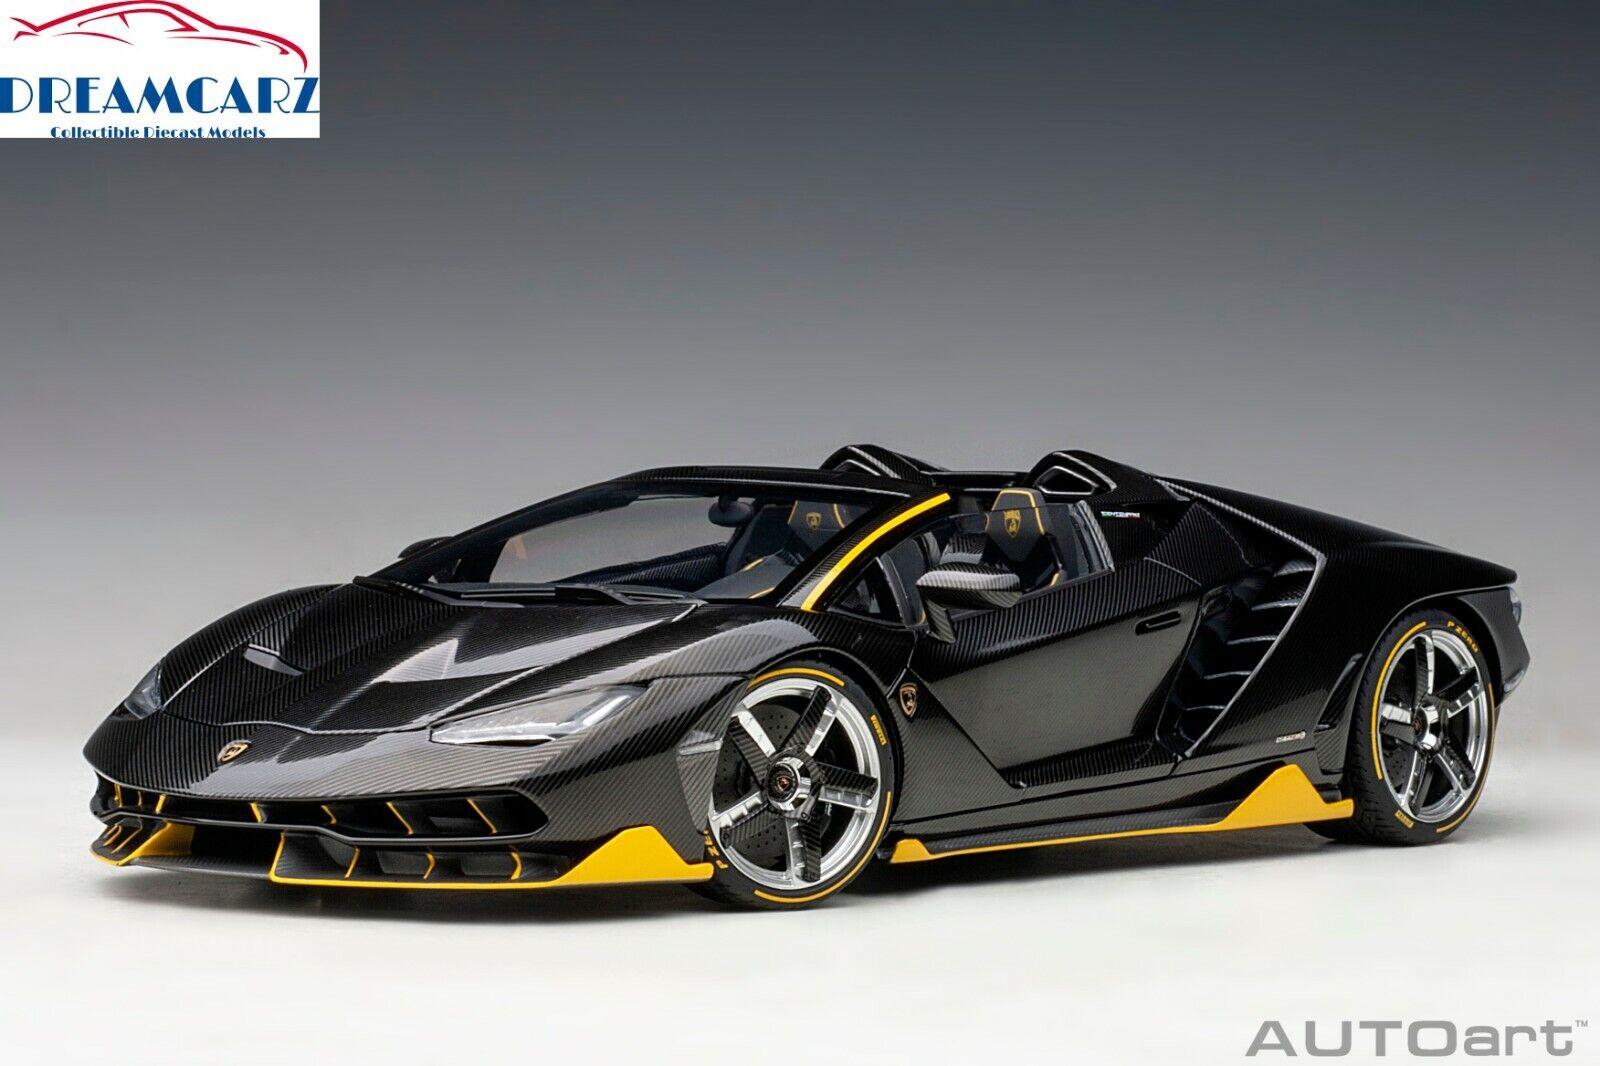 AUTOart 79119 1 18 Lamborghini Centenario Roadster - Clear Carbon Gelb Accents